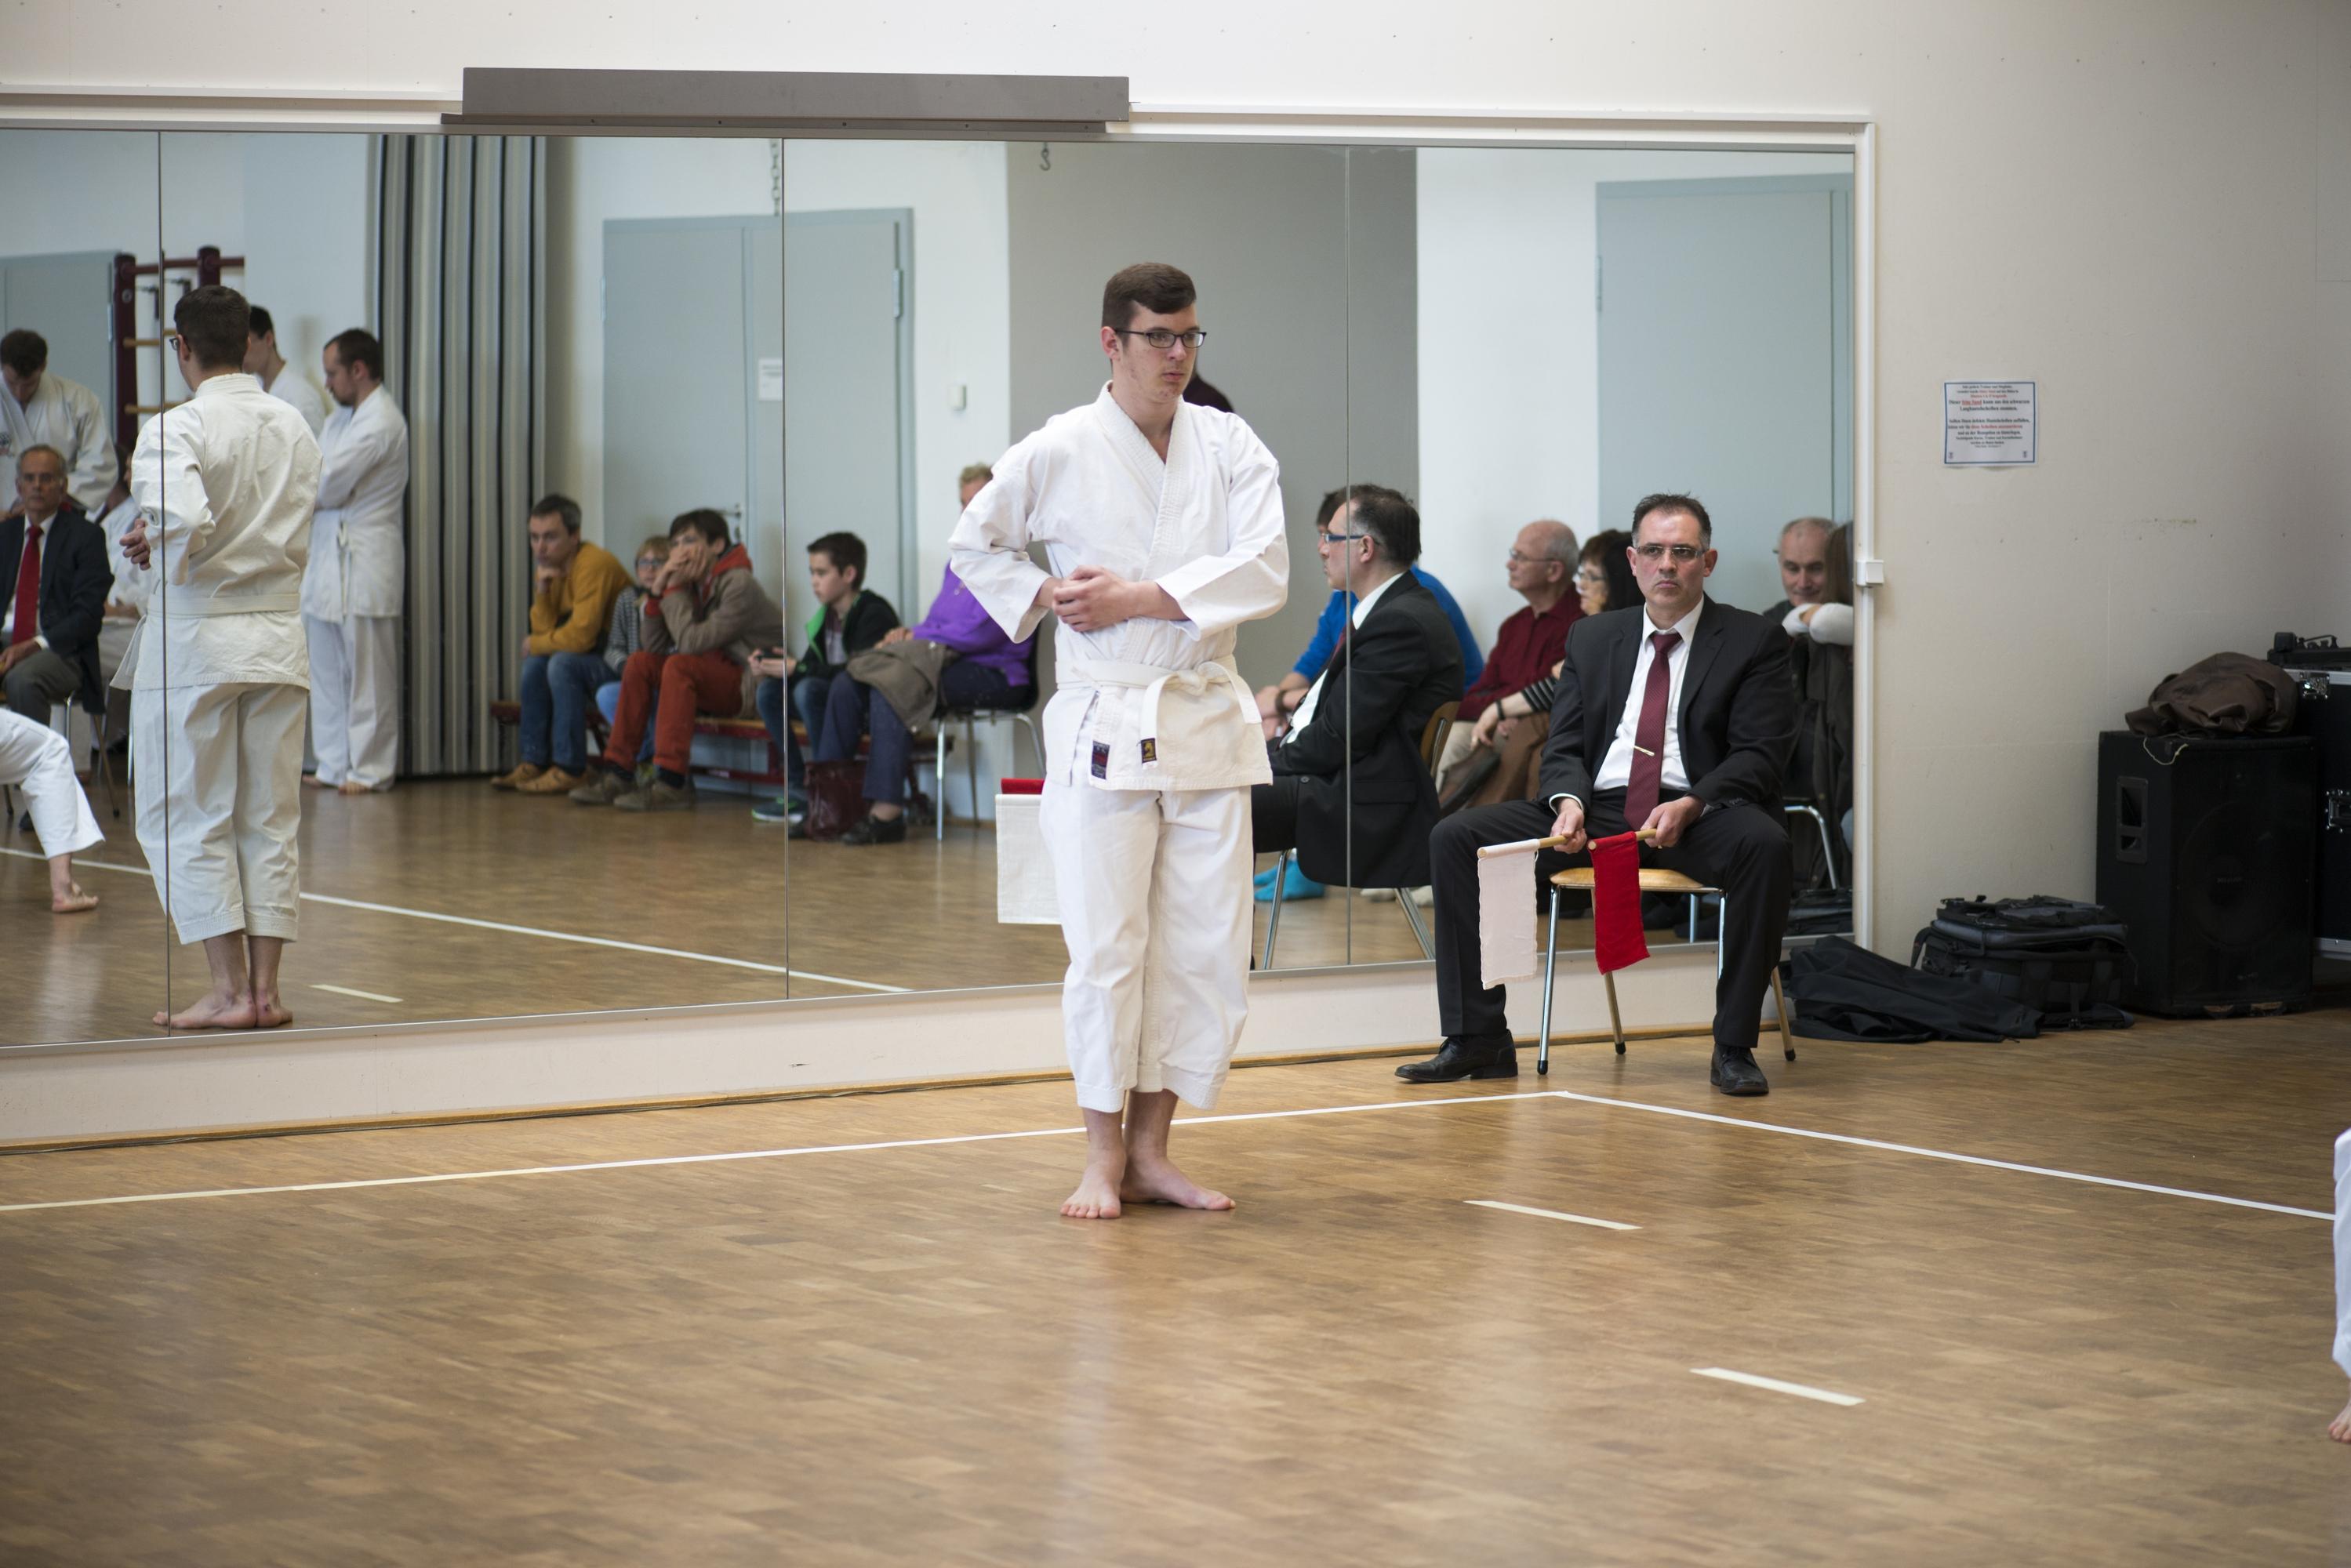 2016-04-26 Kata Turnier Kaarst 168